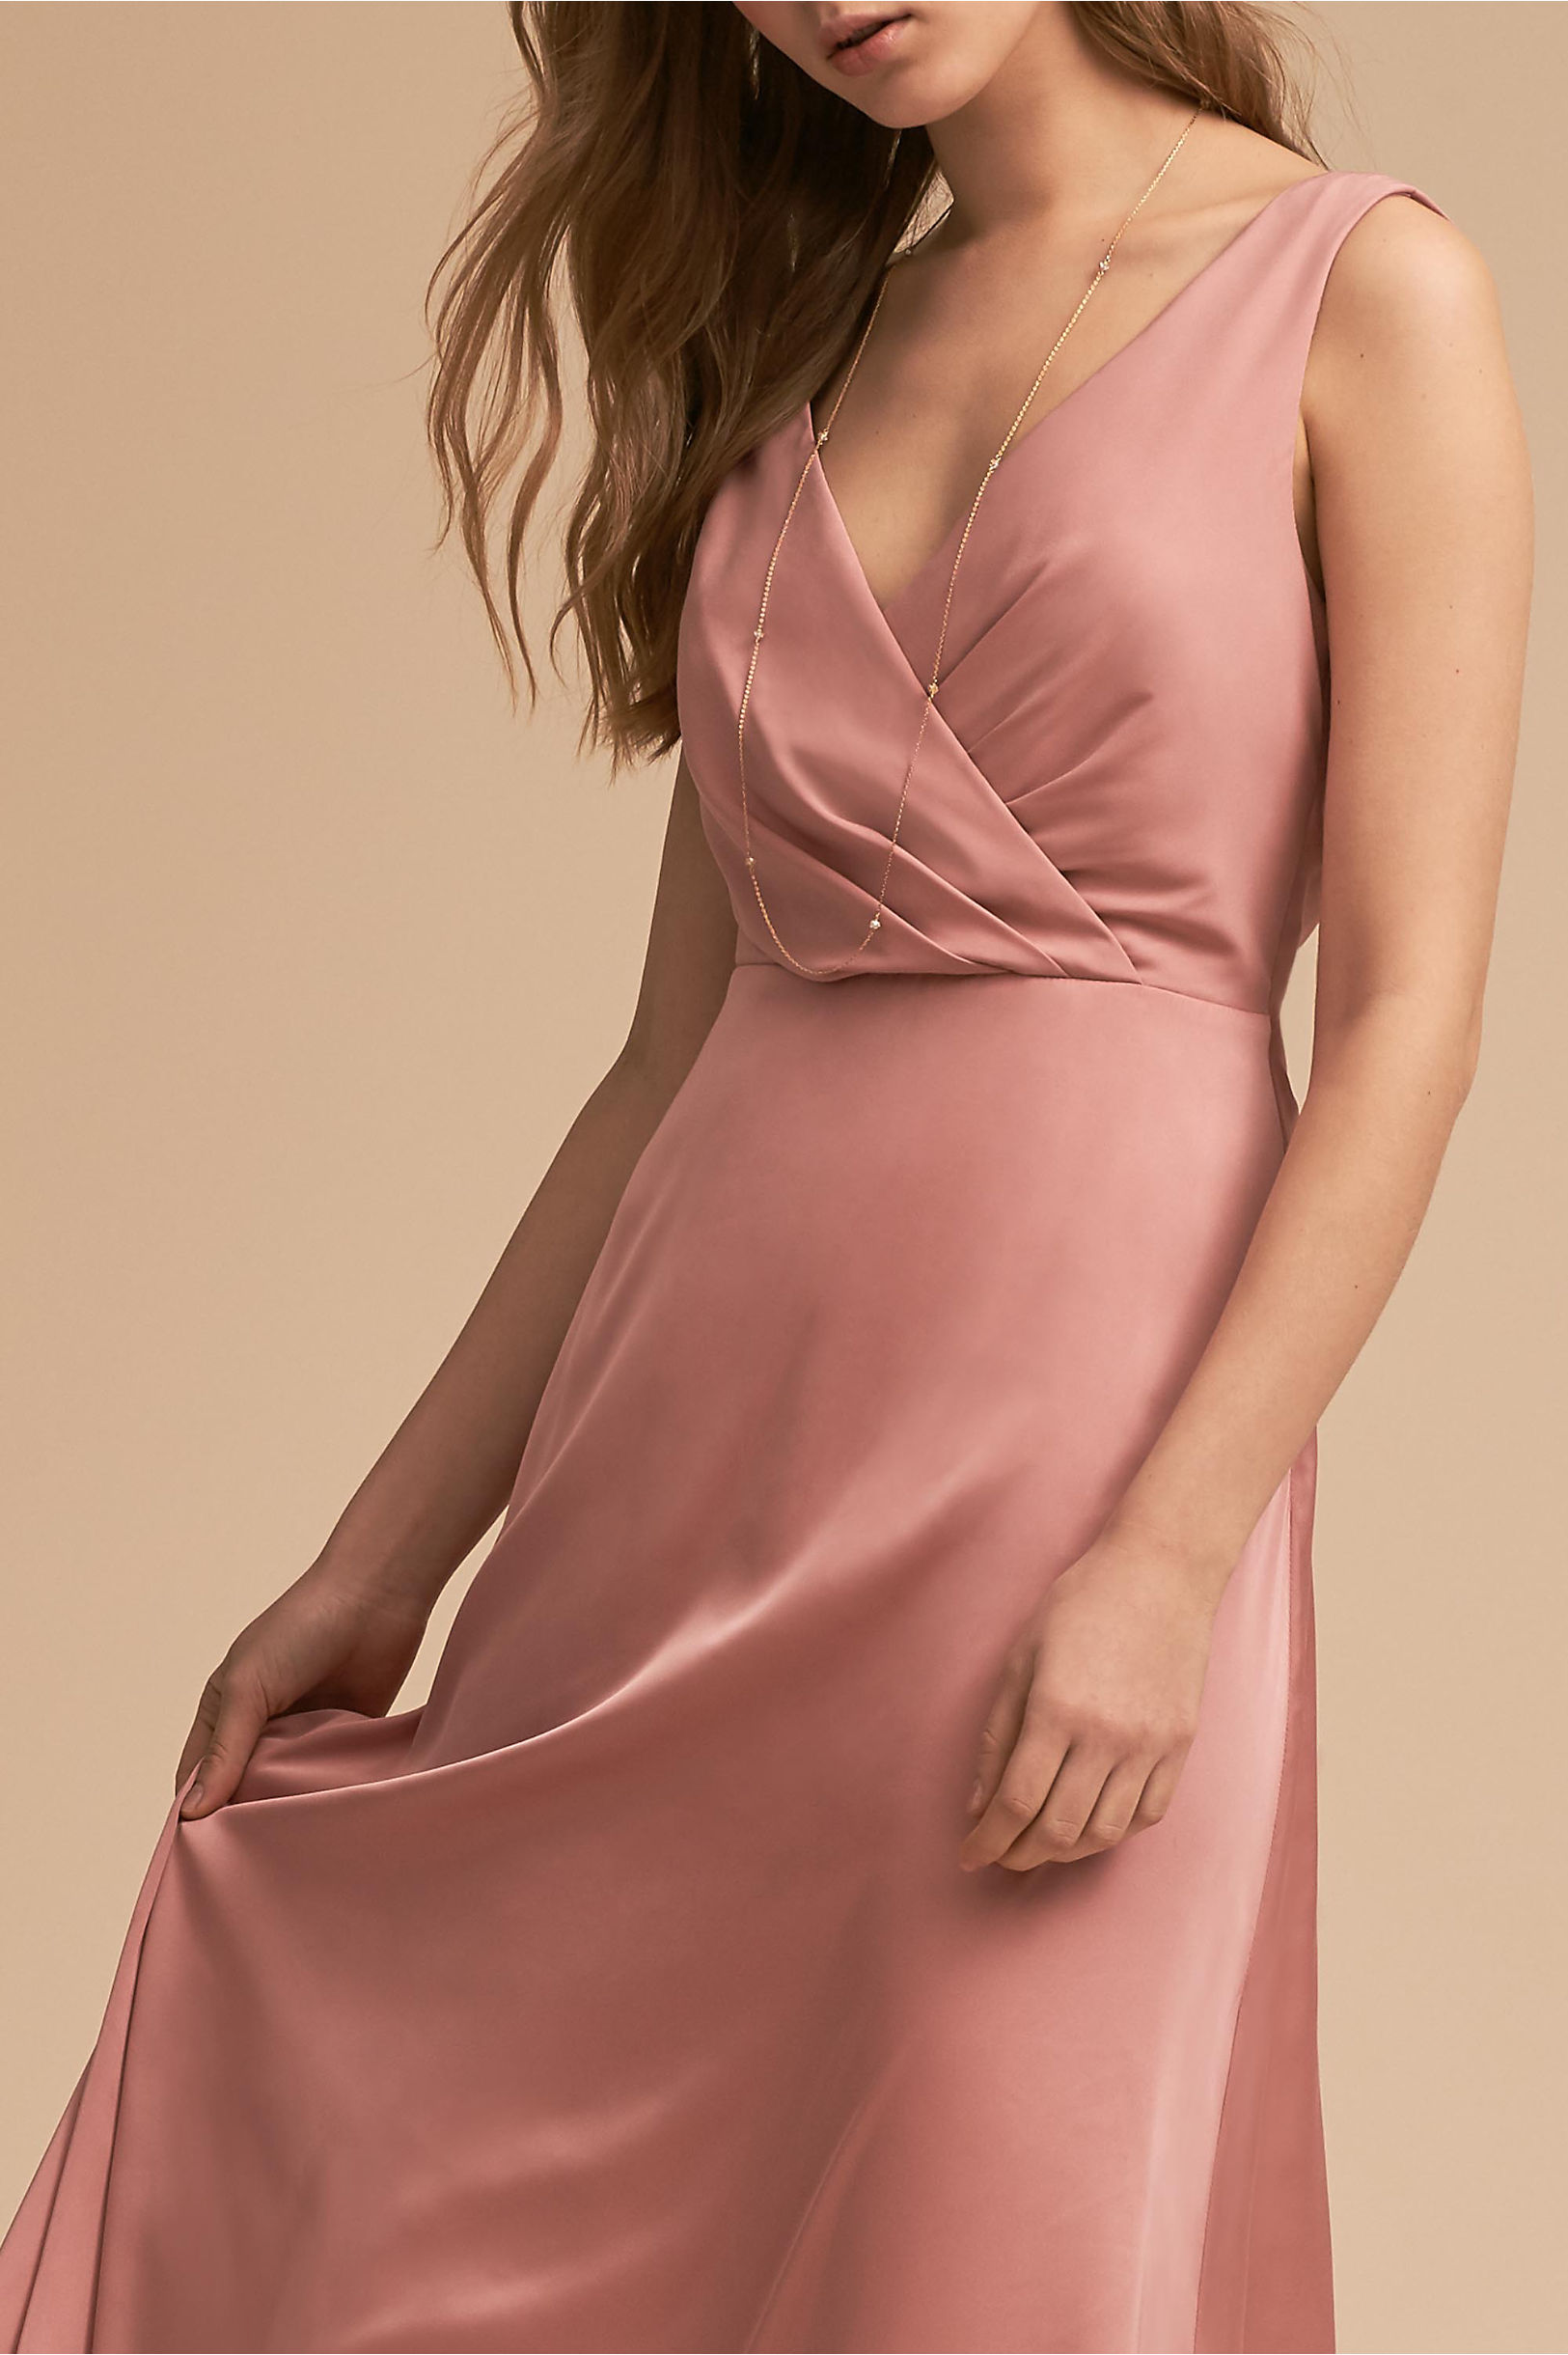 a1dfe7ebeccb Donna Morgan Misty Rose Sabine Dress   BHLDN